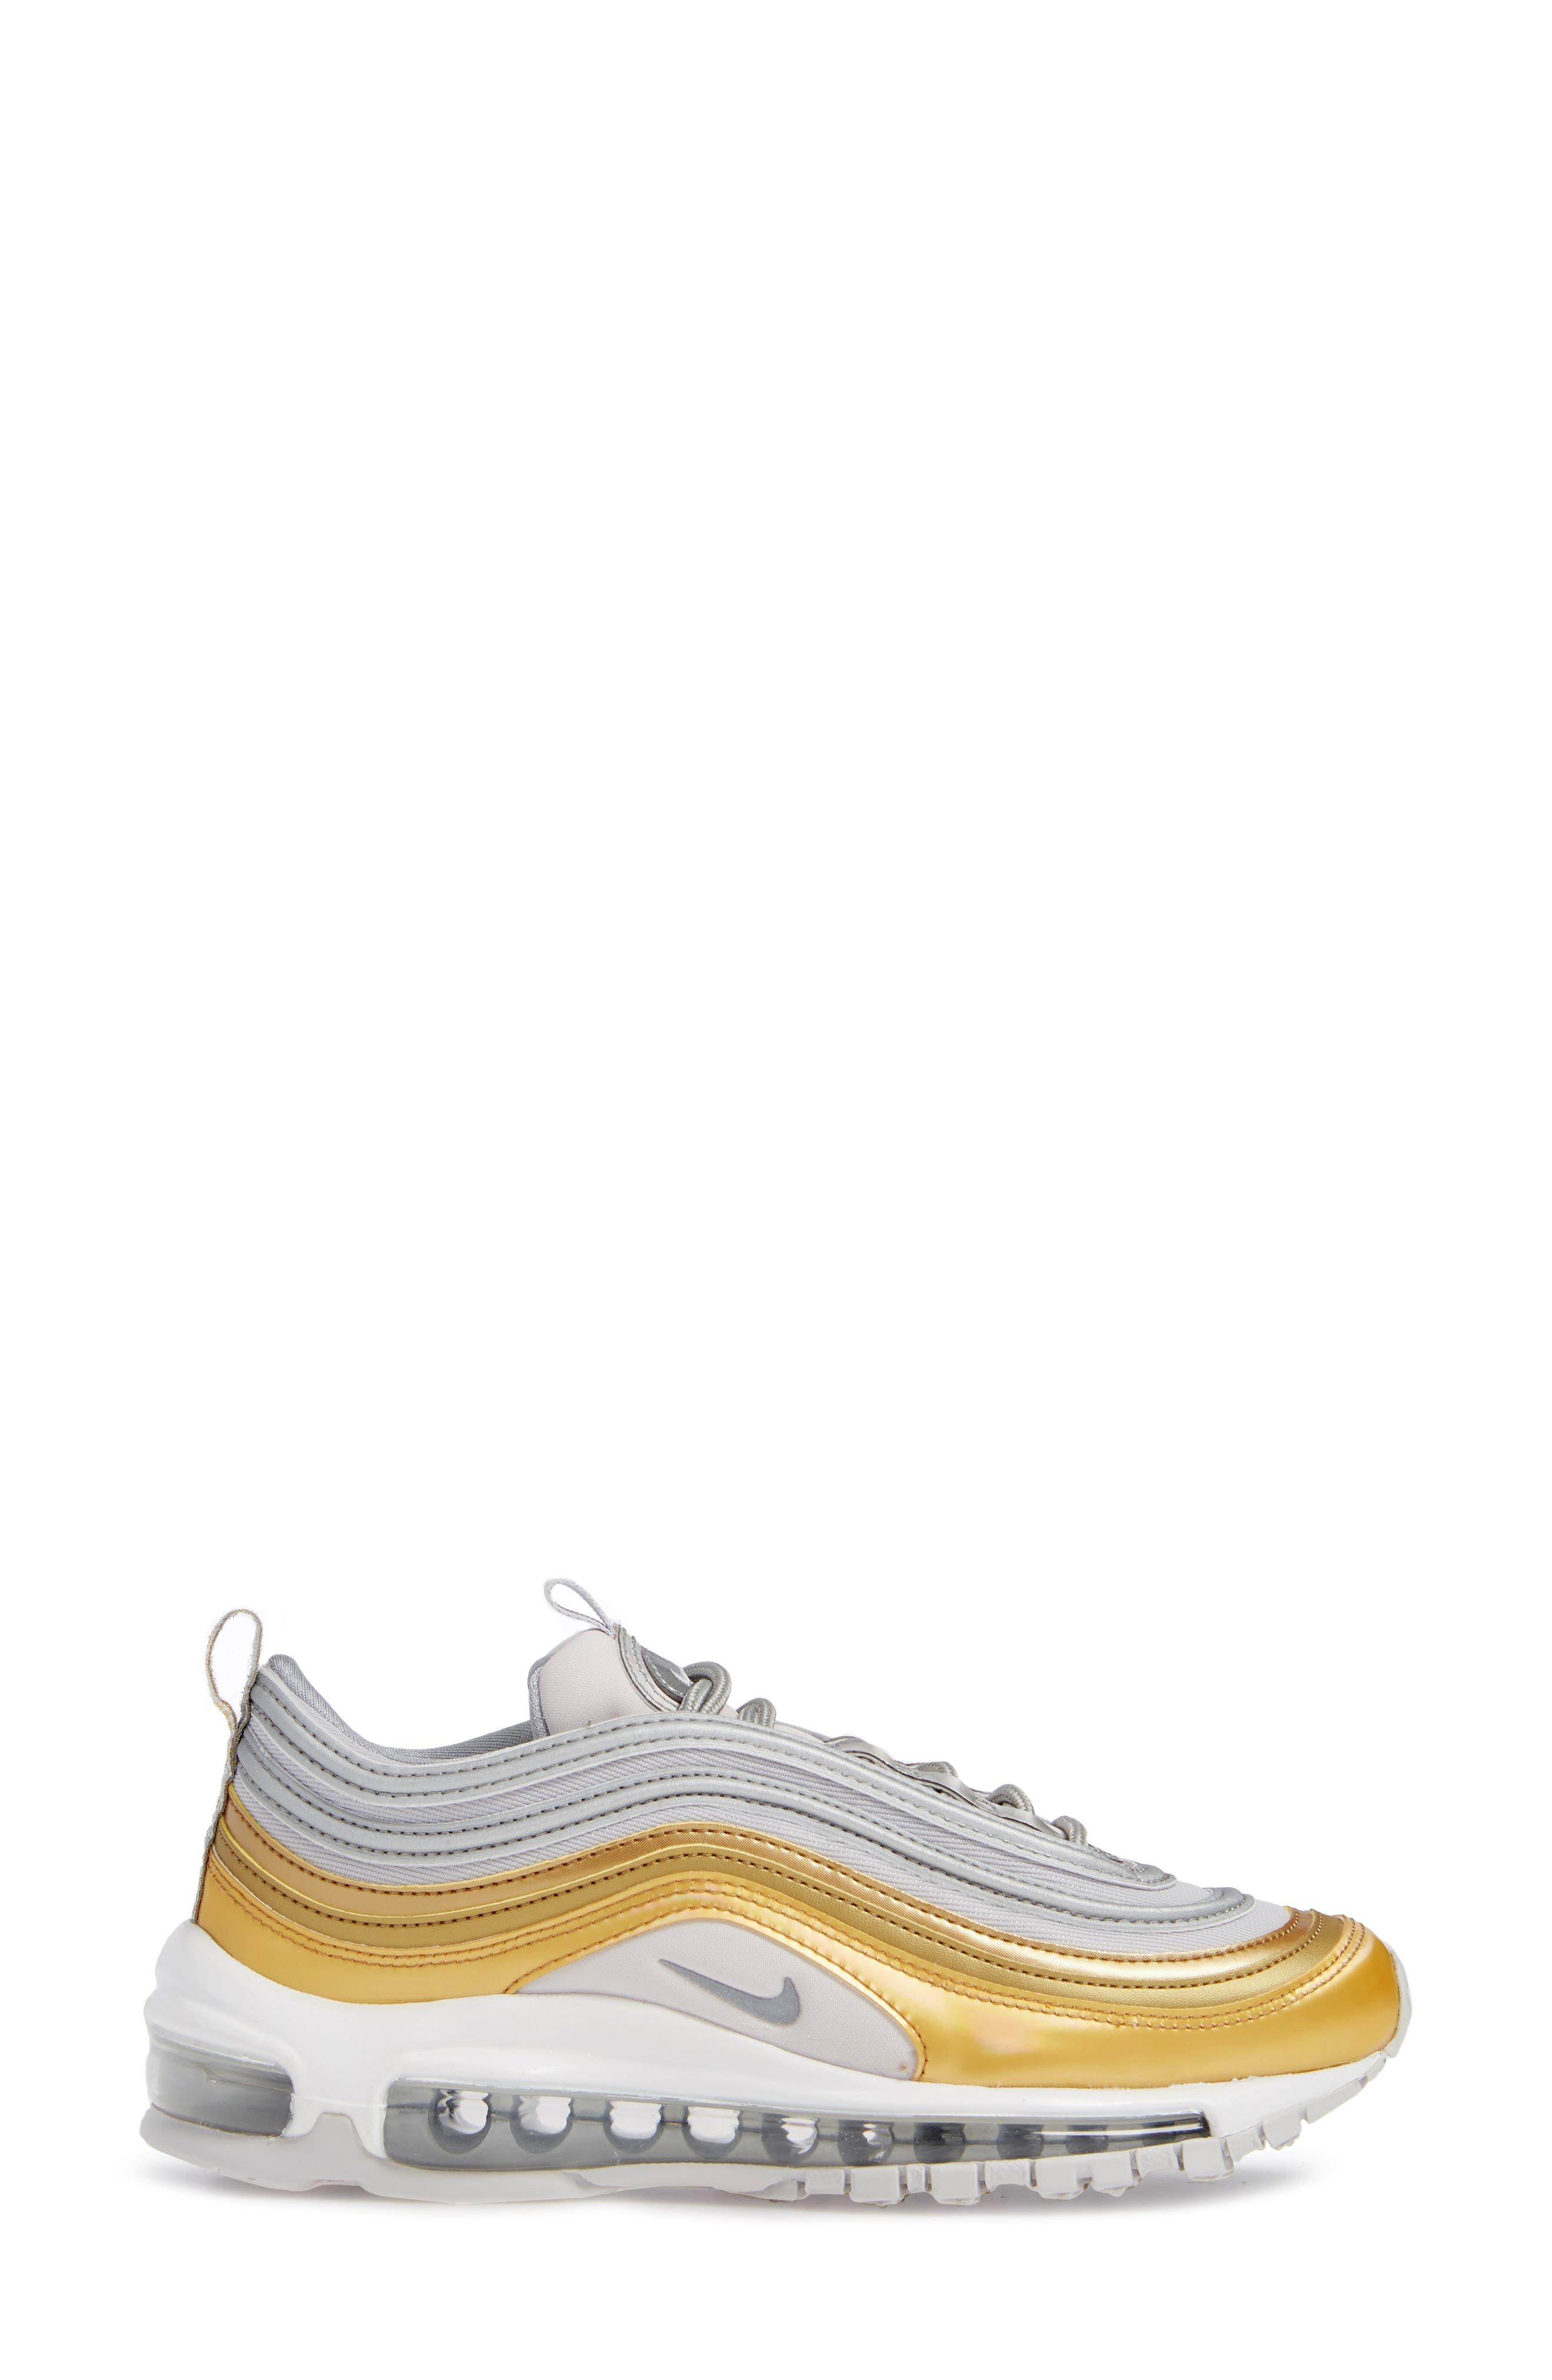 Air Max 97 SE Sneaker,                             Alternate thumbnail 3, color,                             GREY/ METALLIC SILVER- GOLD